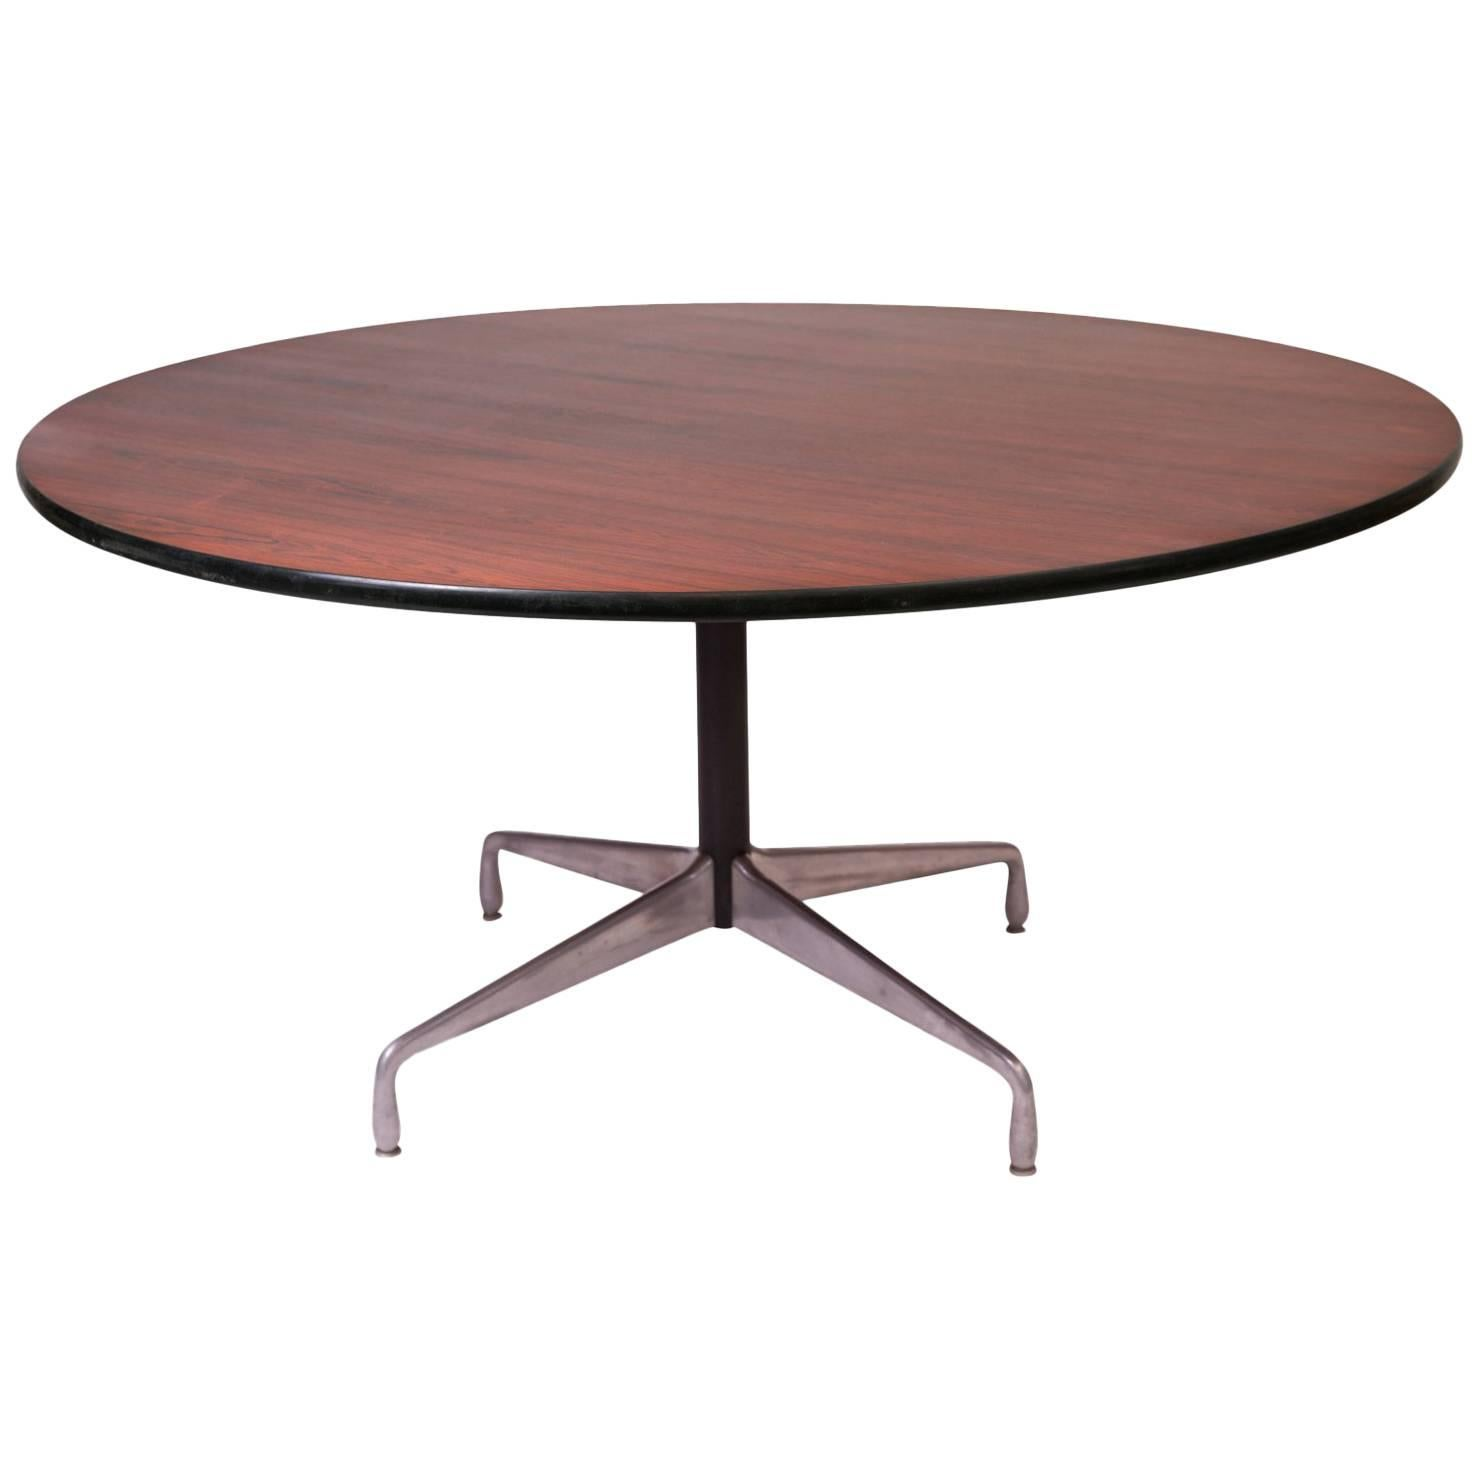 Eames Herman Miller Rosewood Dining Table